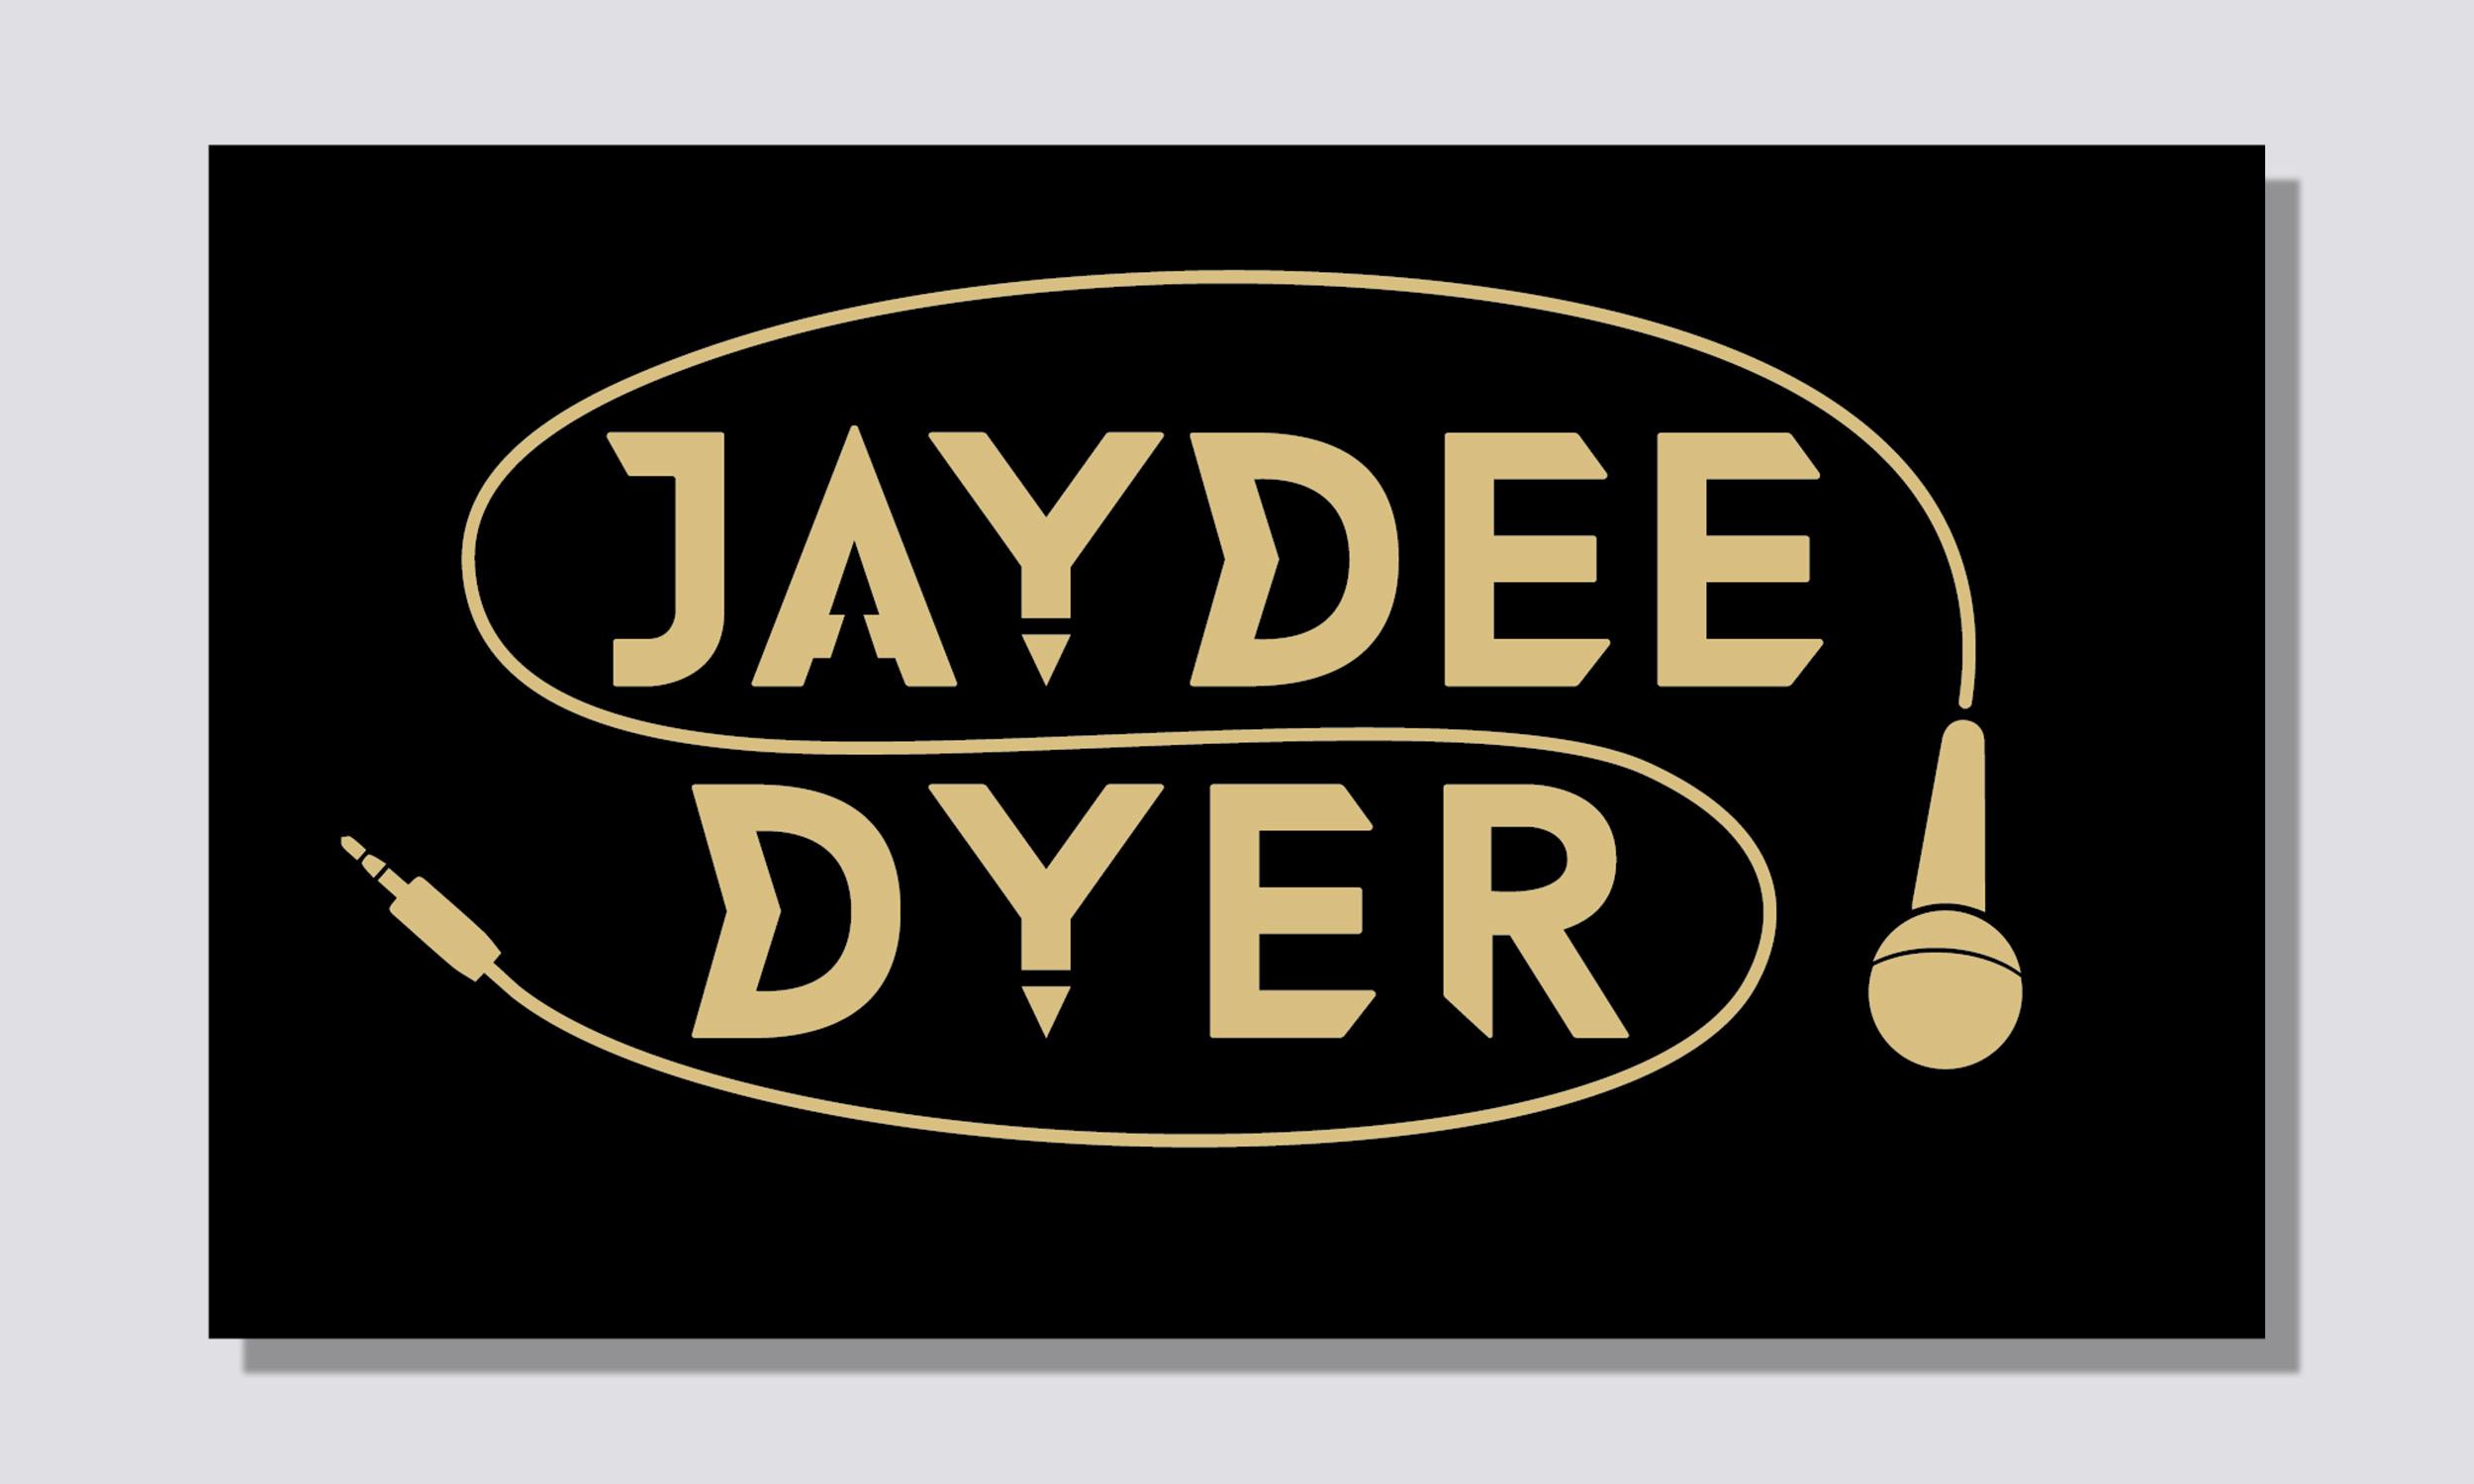 jaydee_large_logo_laid_out.jpg